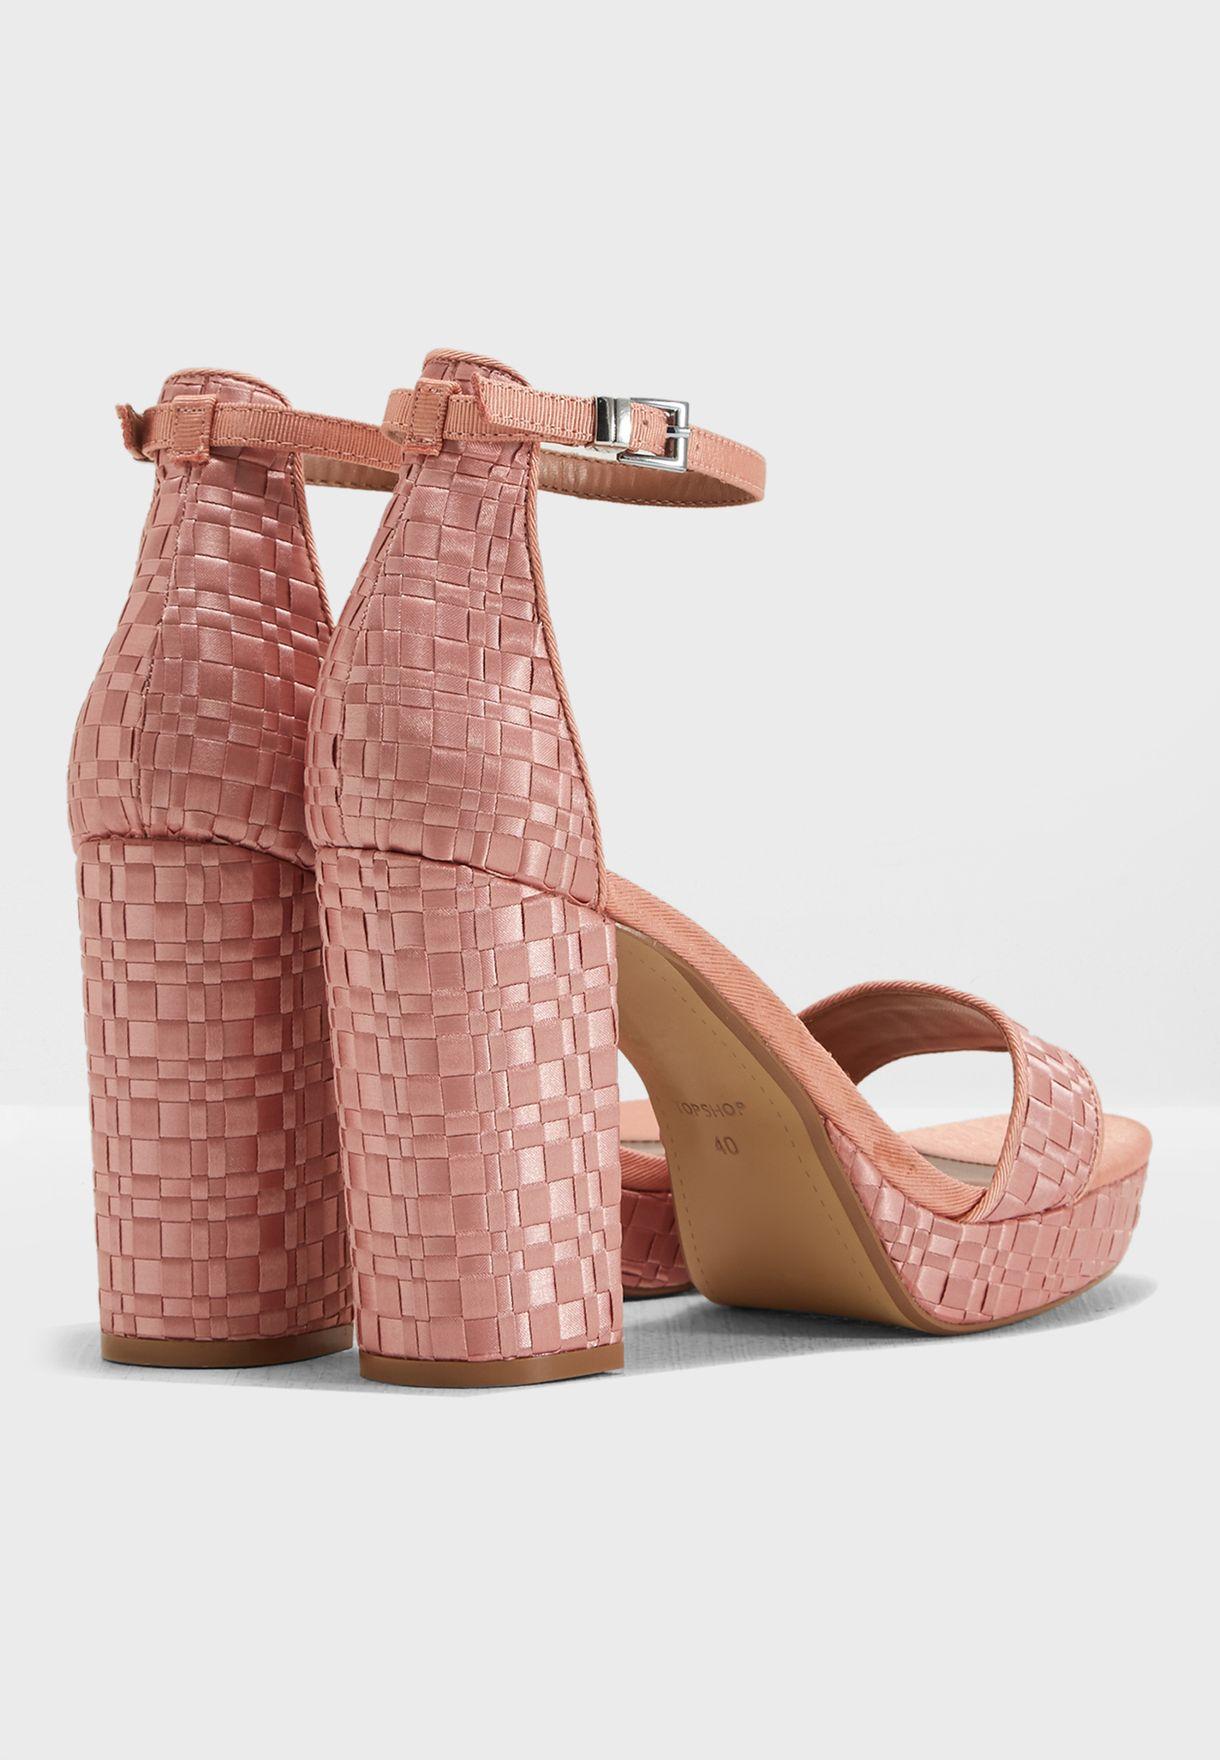 84943d7b78cb Shop Topshop pink Sloane Woven Platform Sandal 32S09NPNK for ...